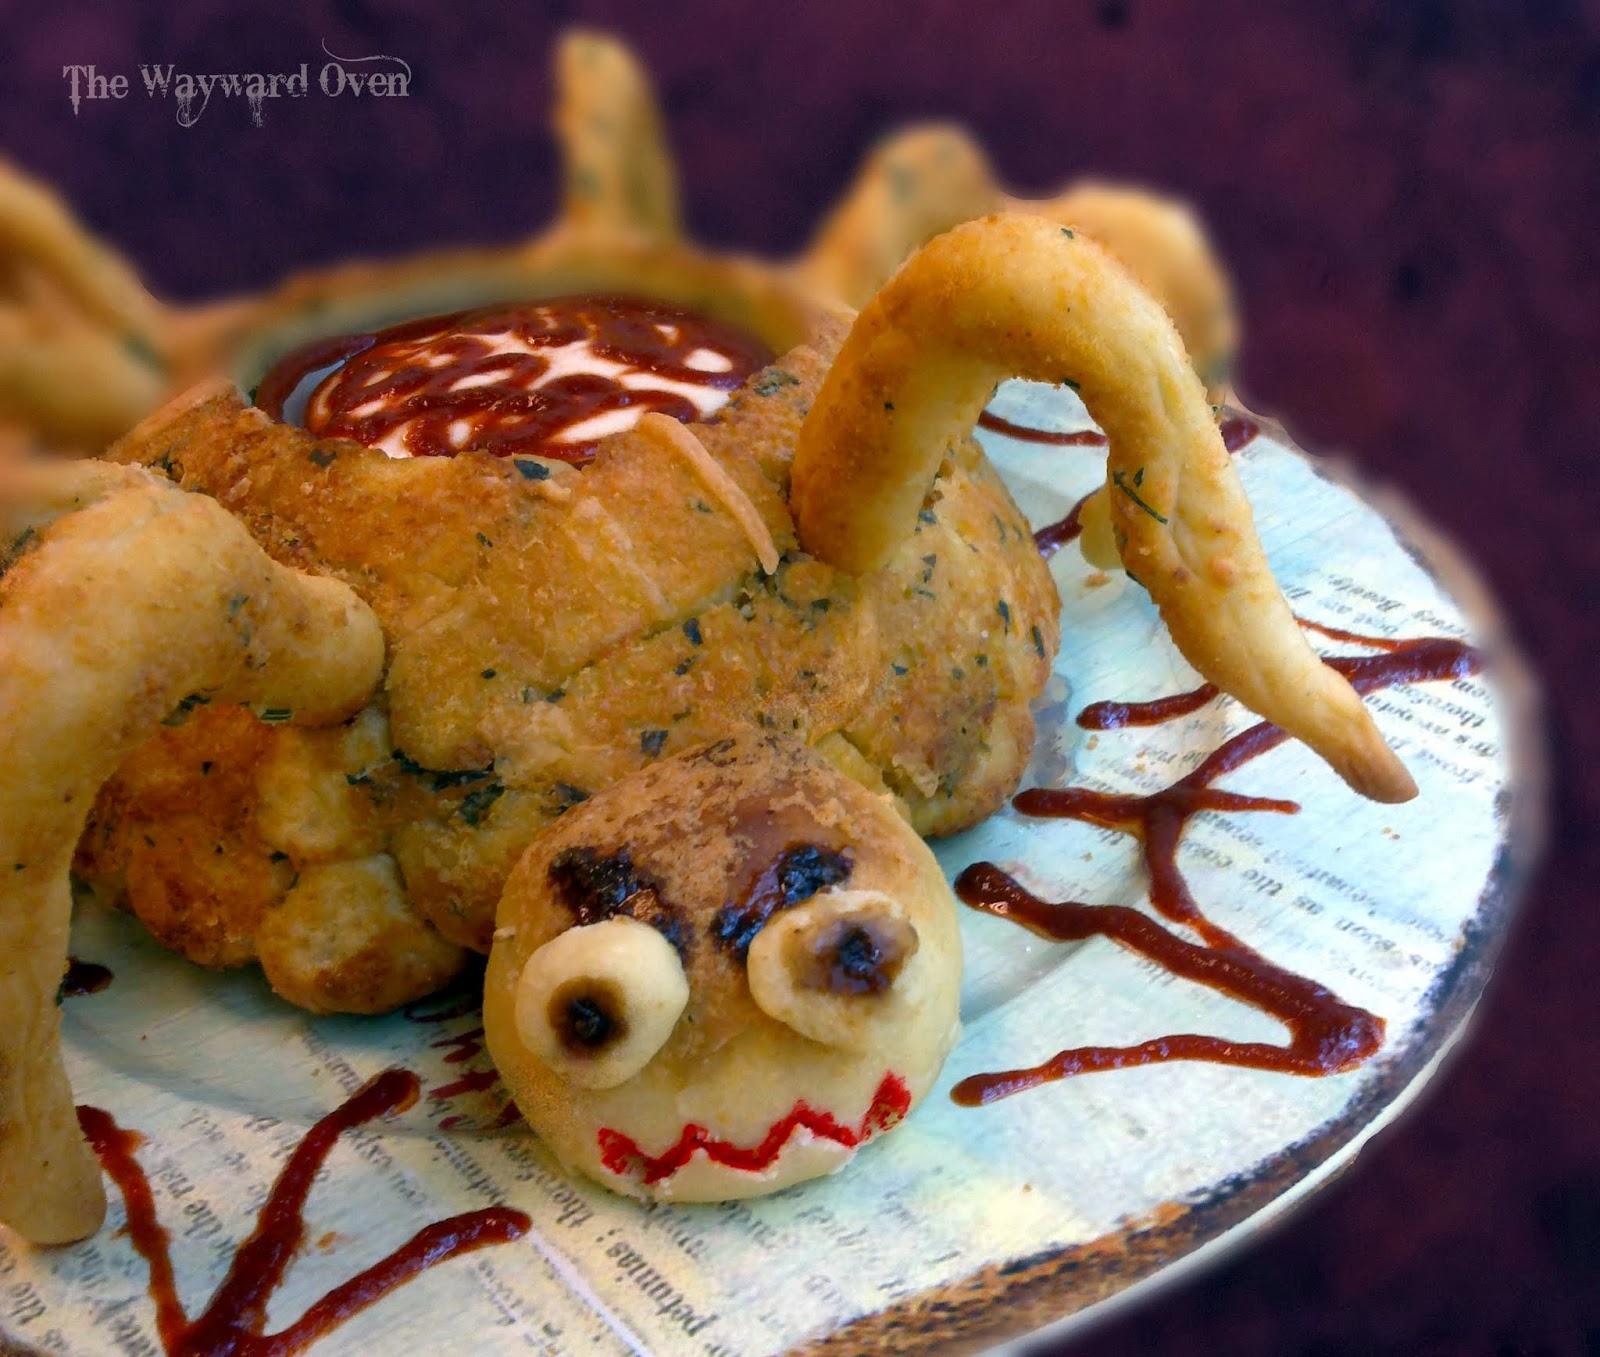 The Wayward Oven: Halloween spider monkey bread bowl